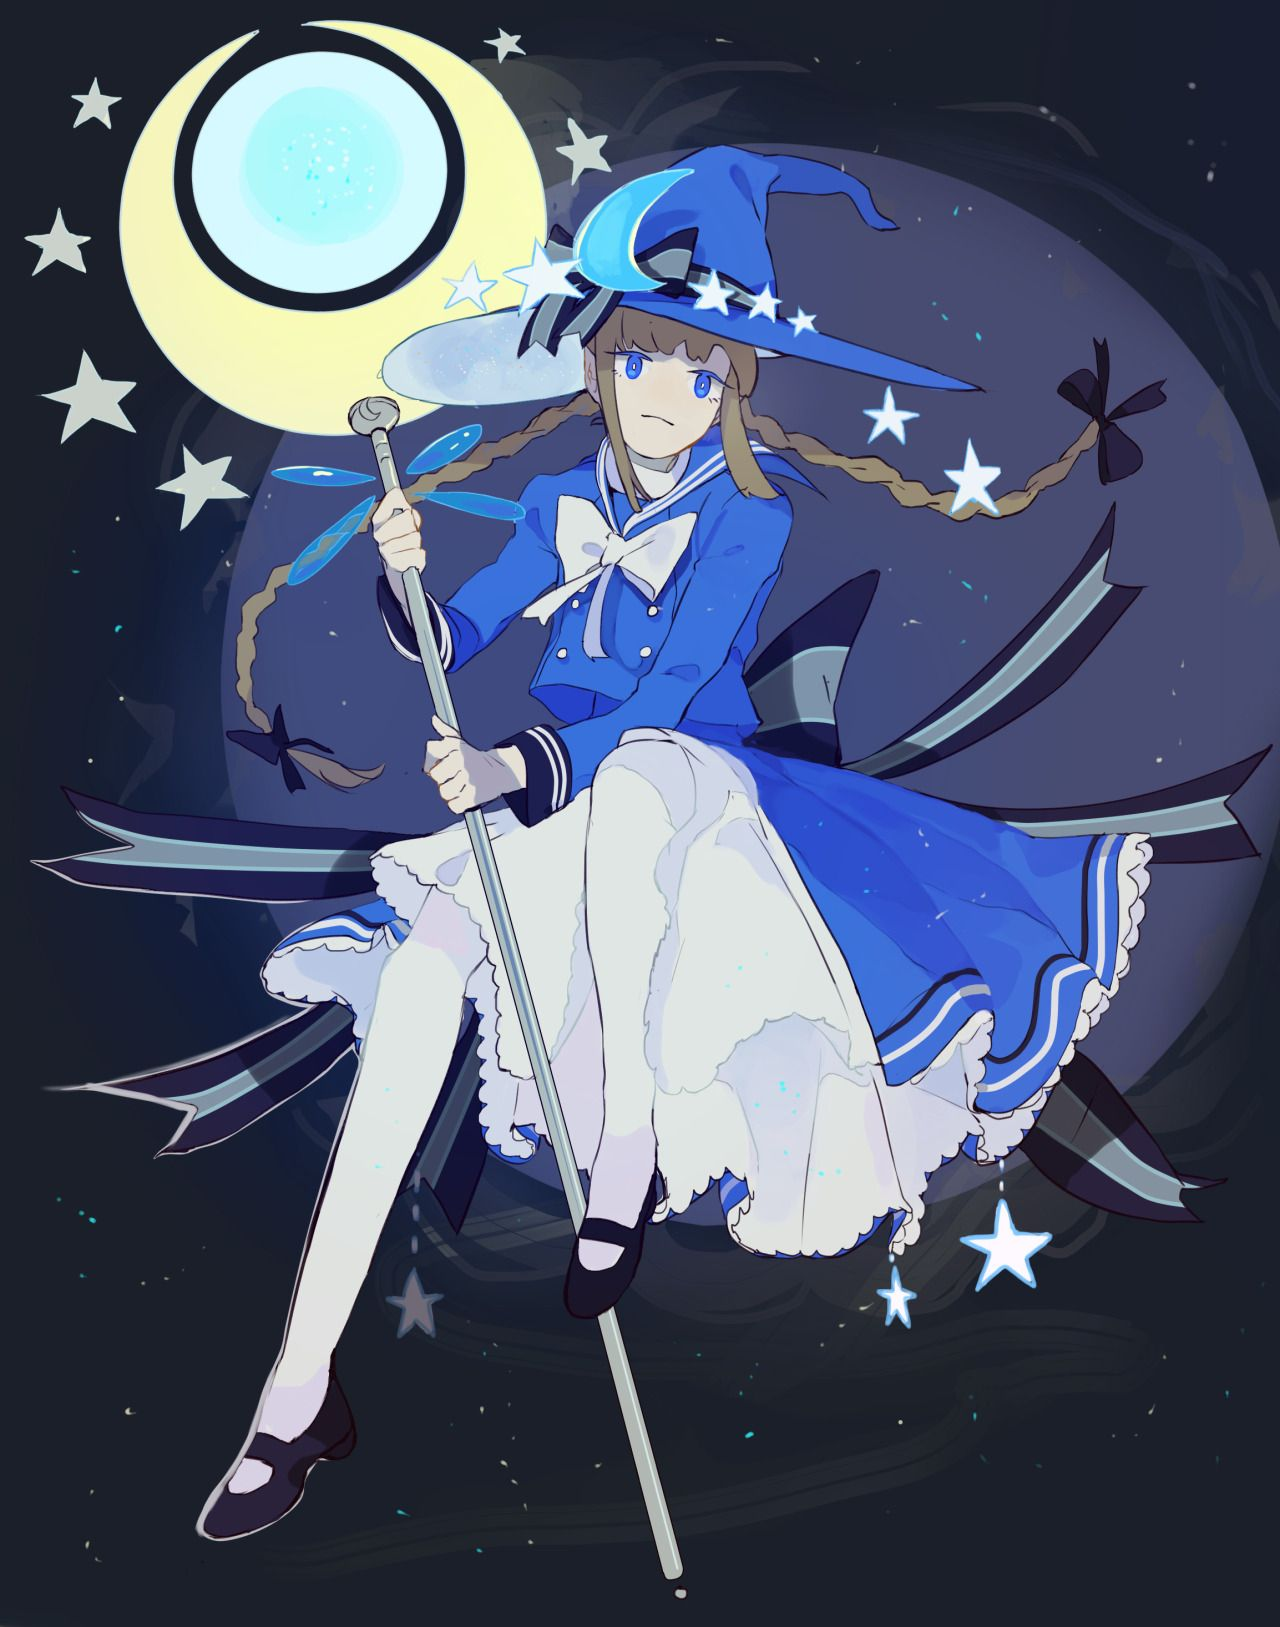 Pin by Krea on Ваданохара и ВСМ | Blue sea, Anime, Grey ...